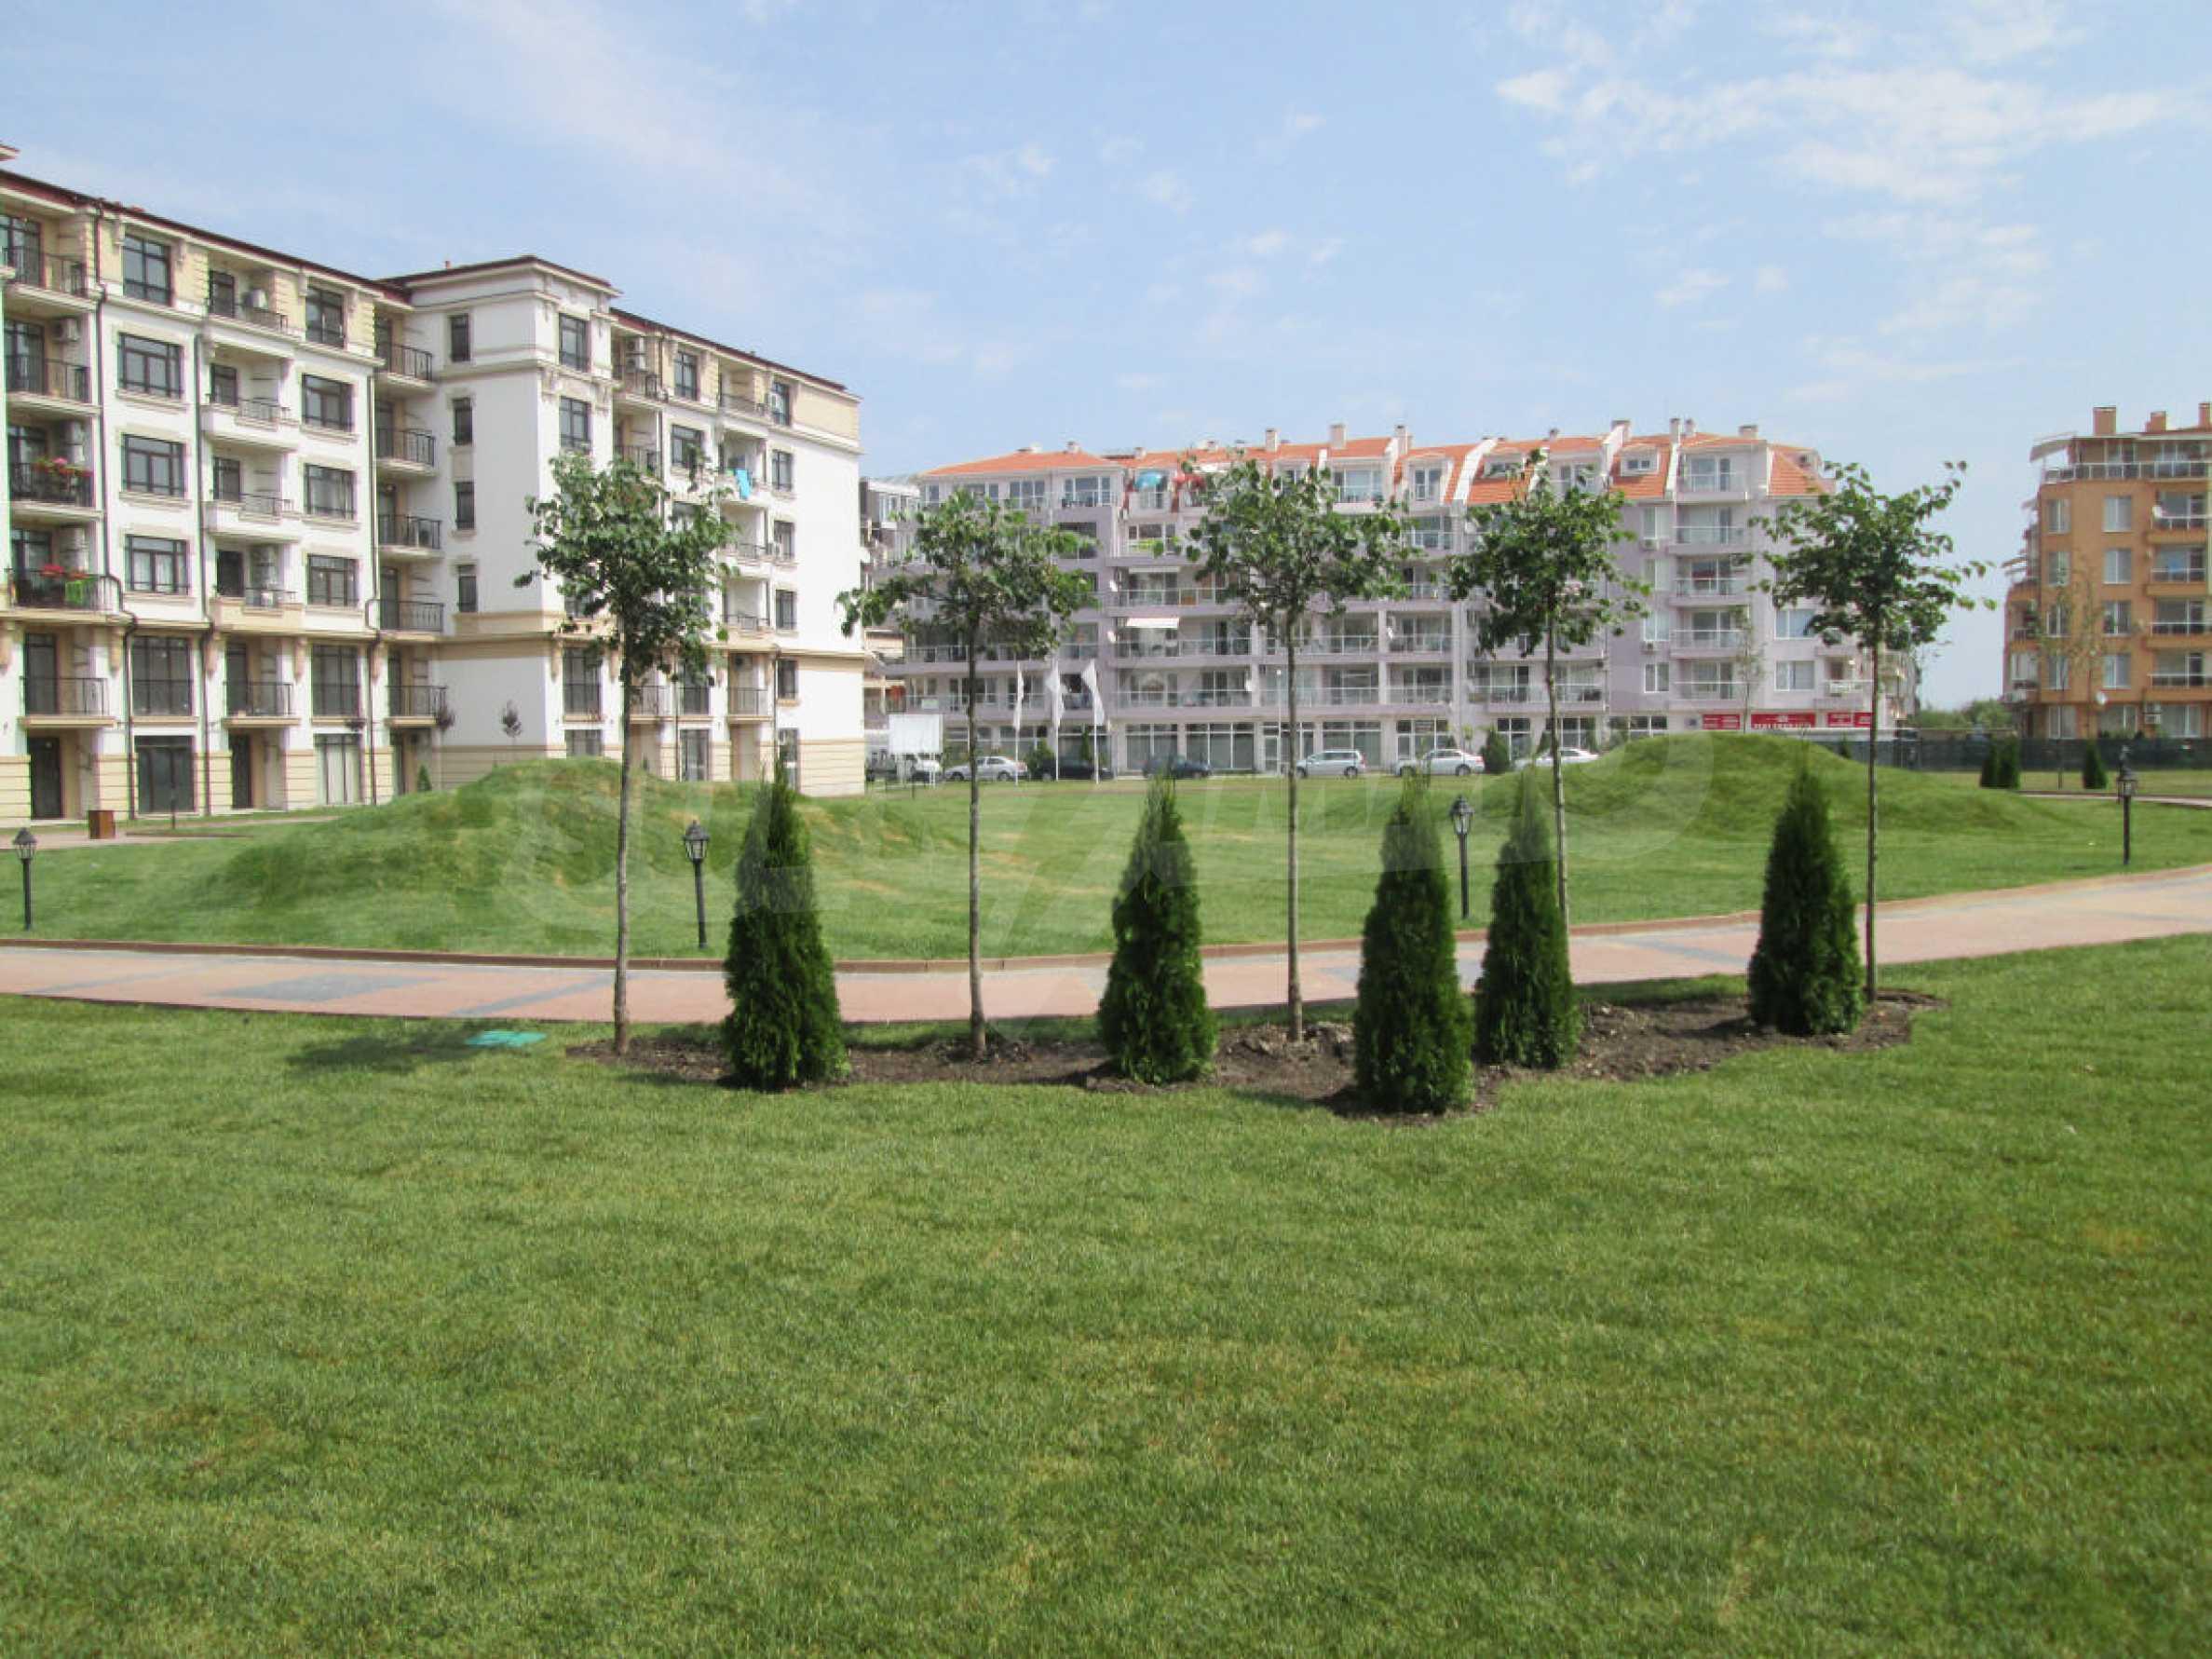 Aivazovsky Park 39